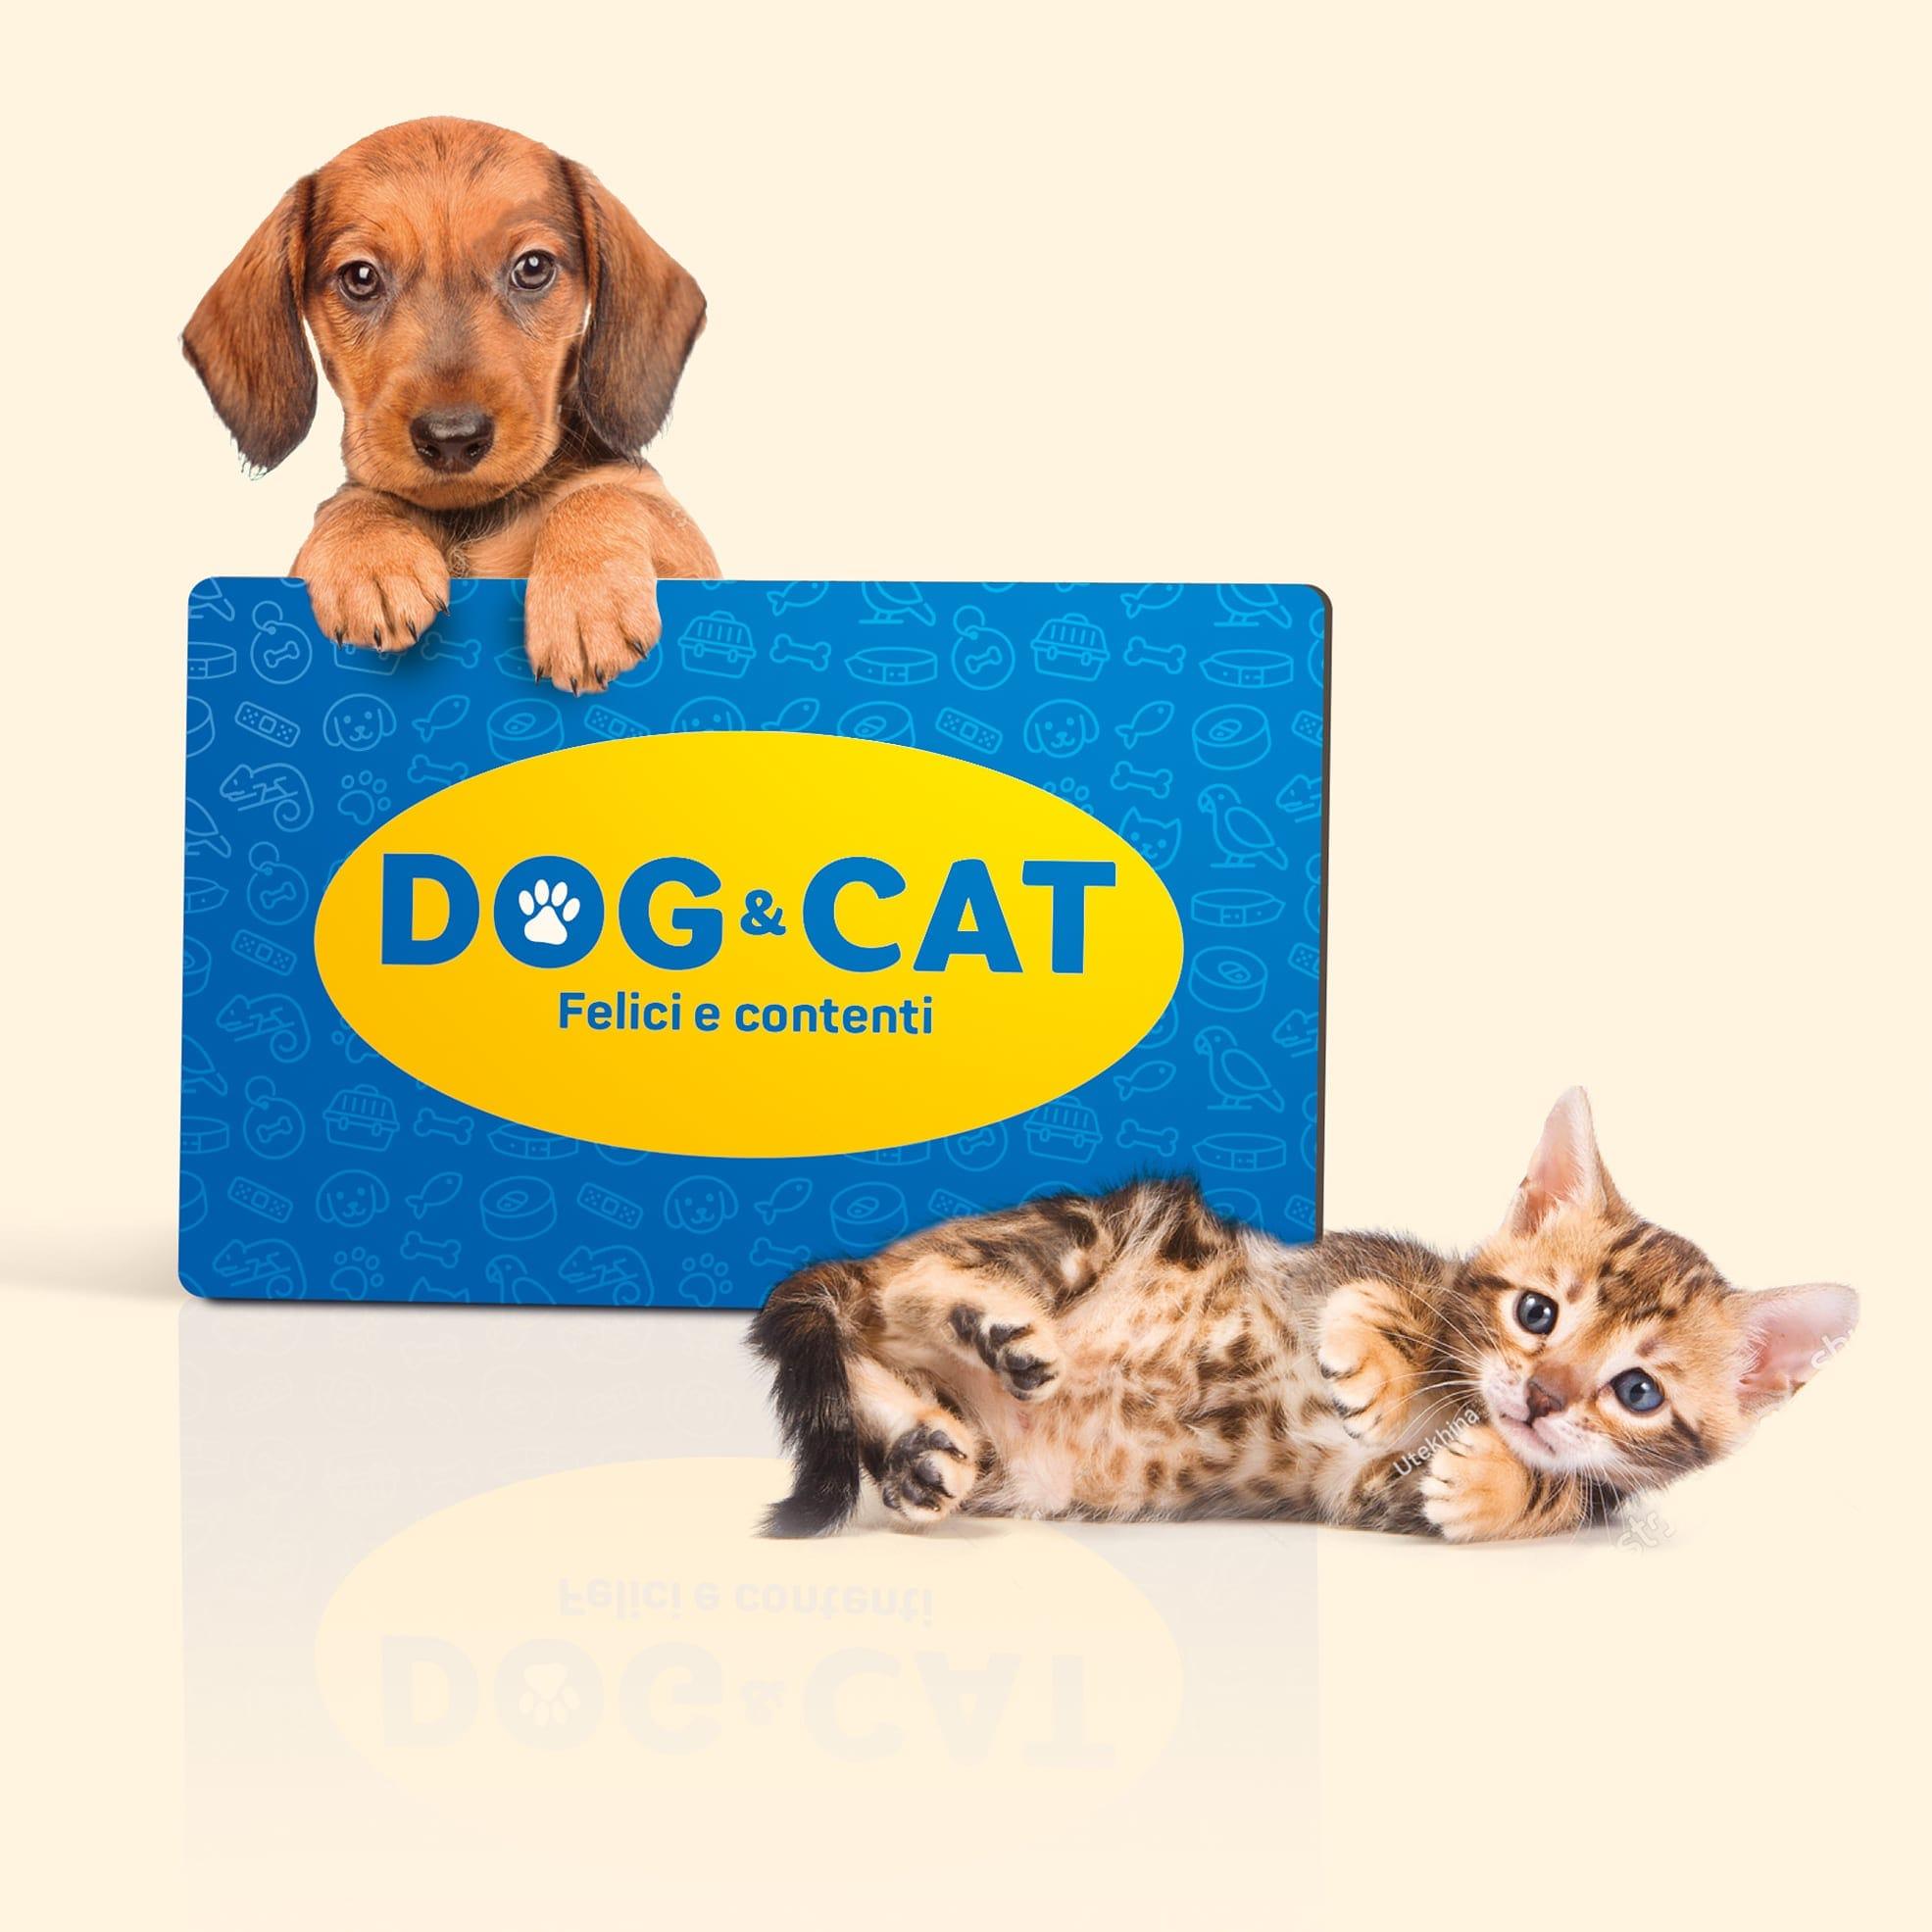 Dog&Cat: Fidelity Card